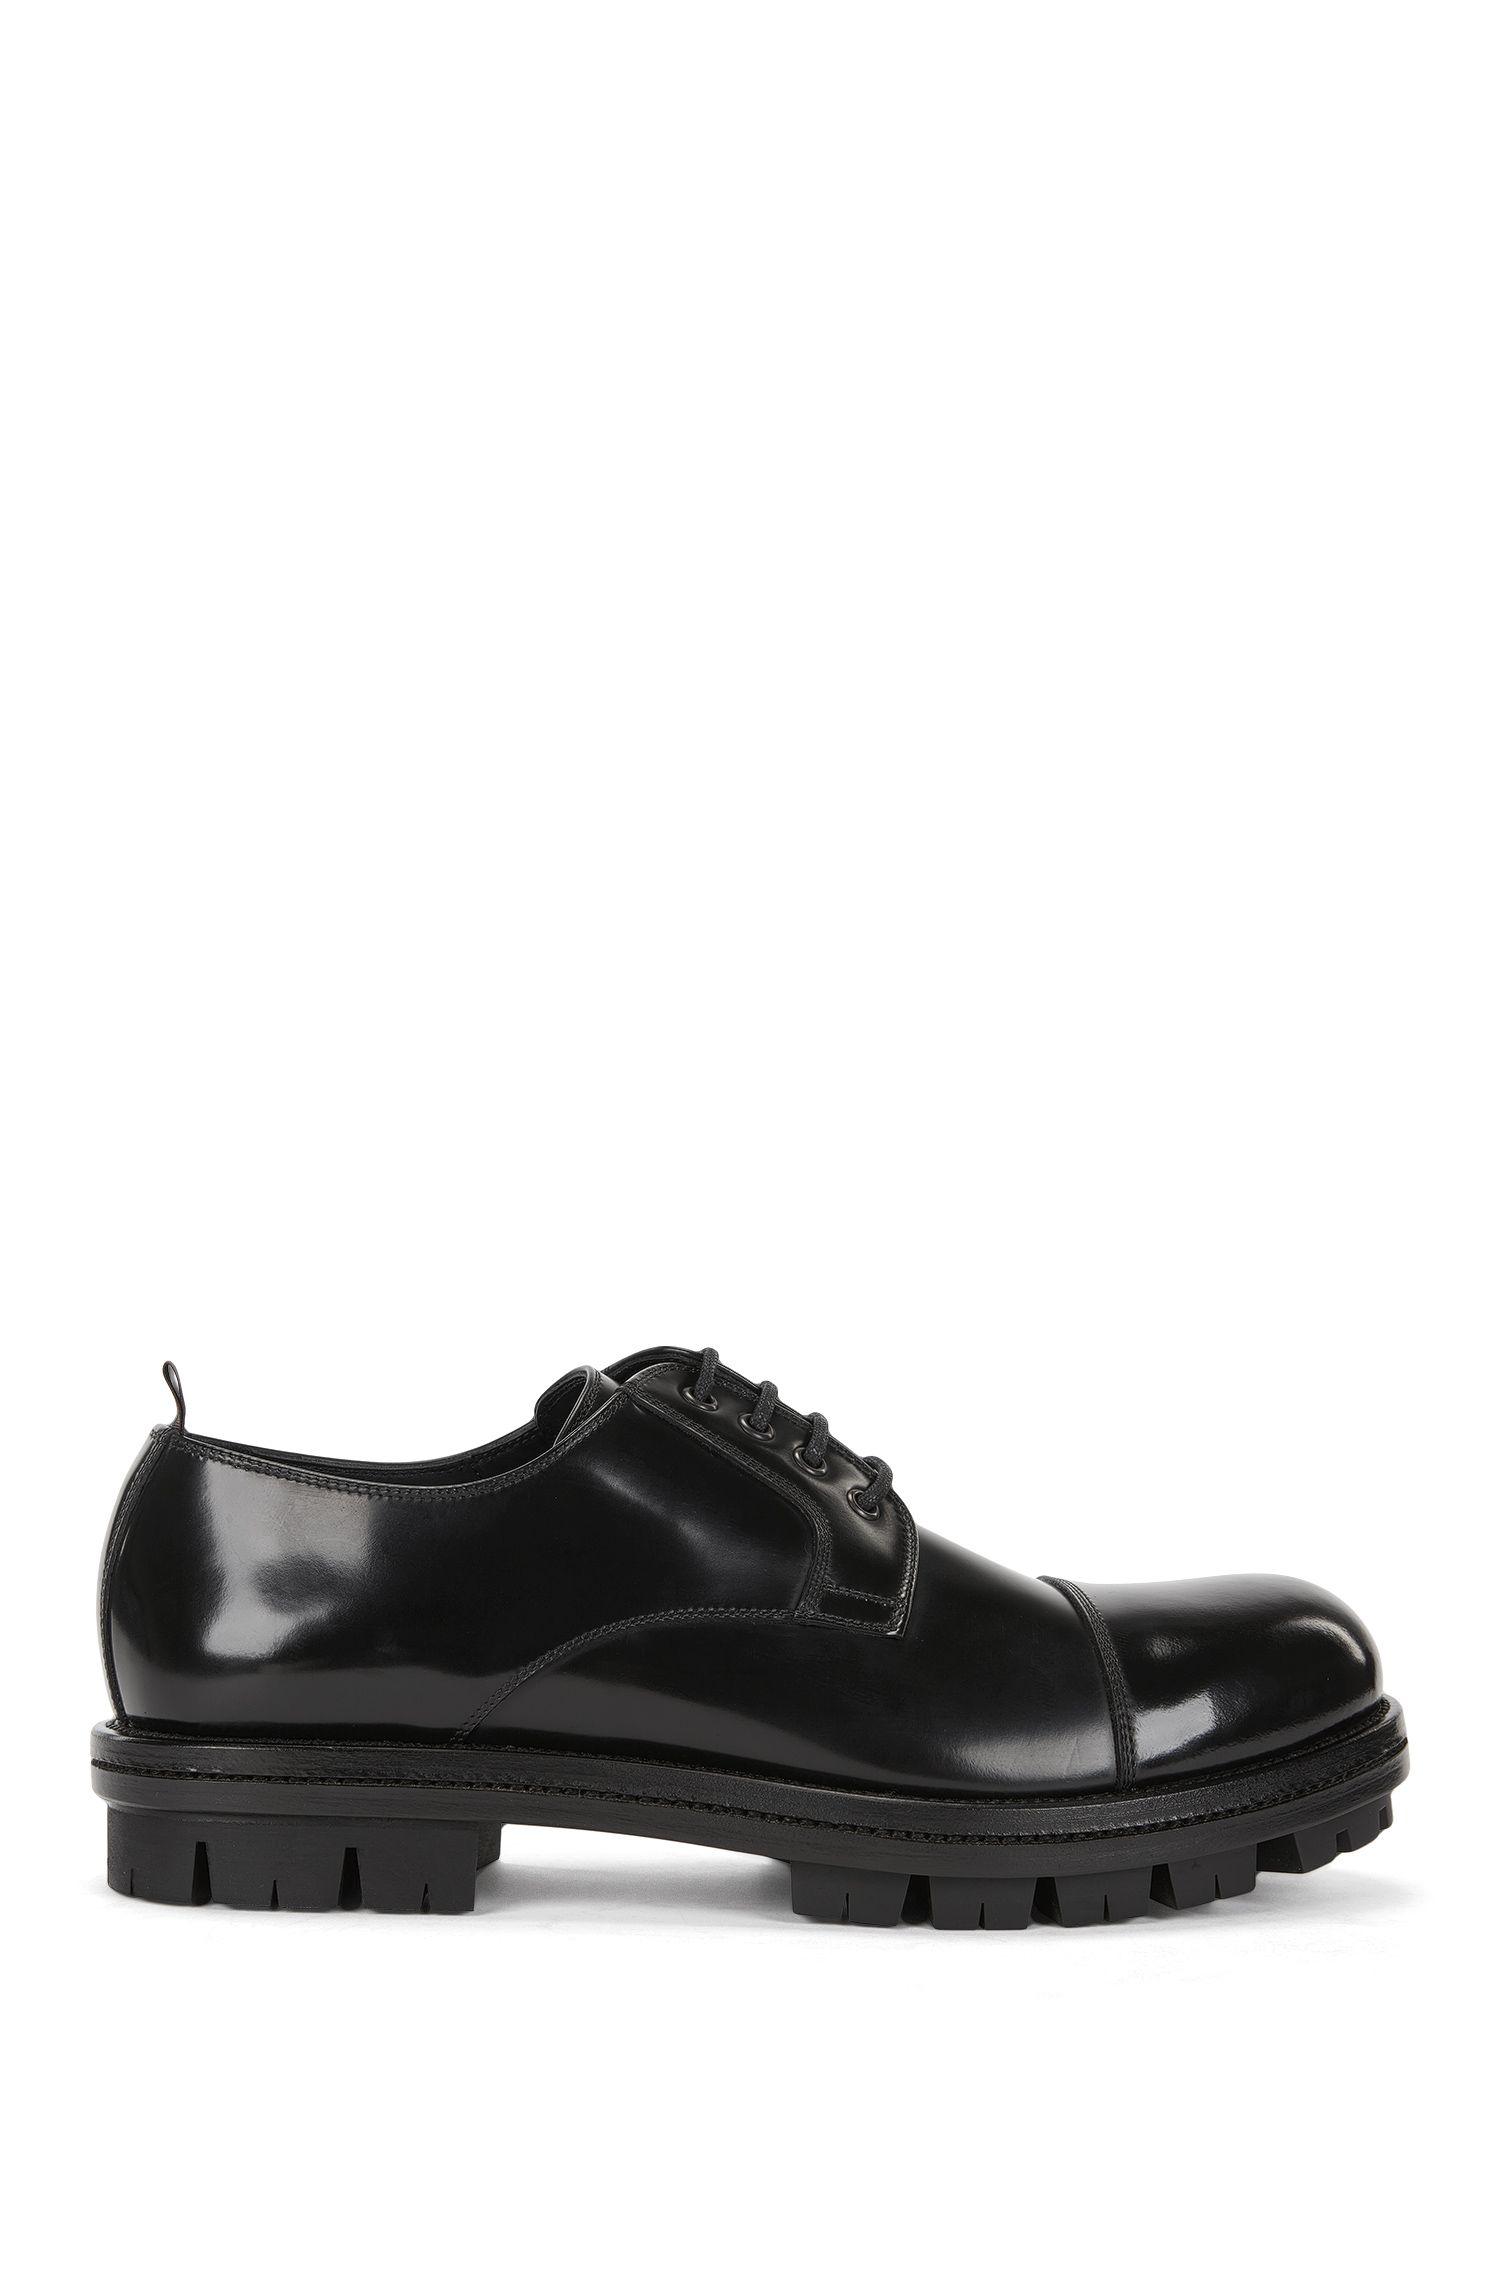 Patent Leather Shoe | Twist Derb Ct